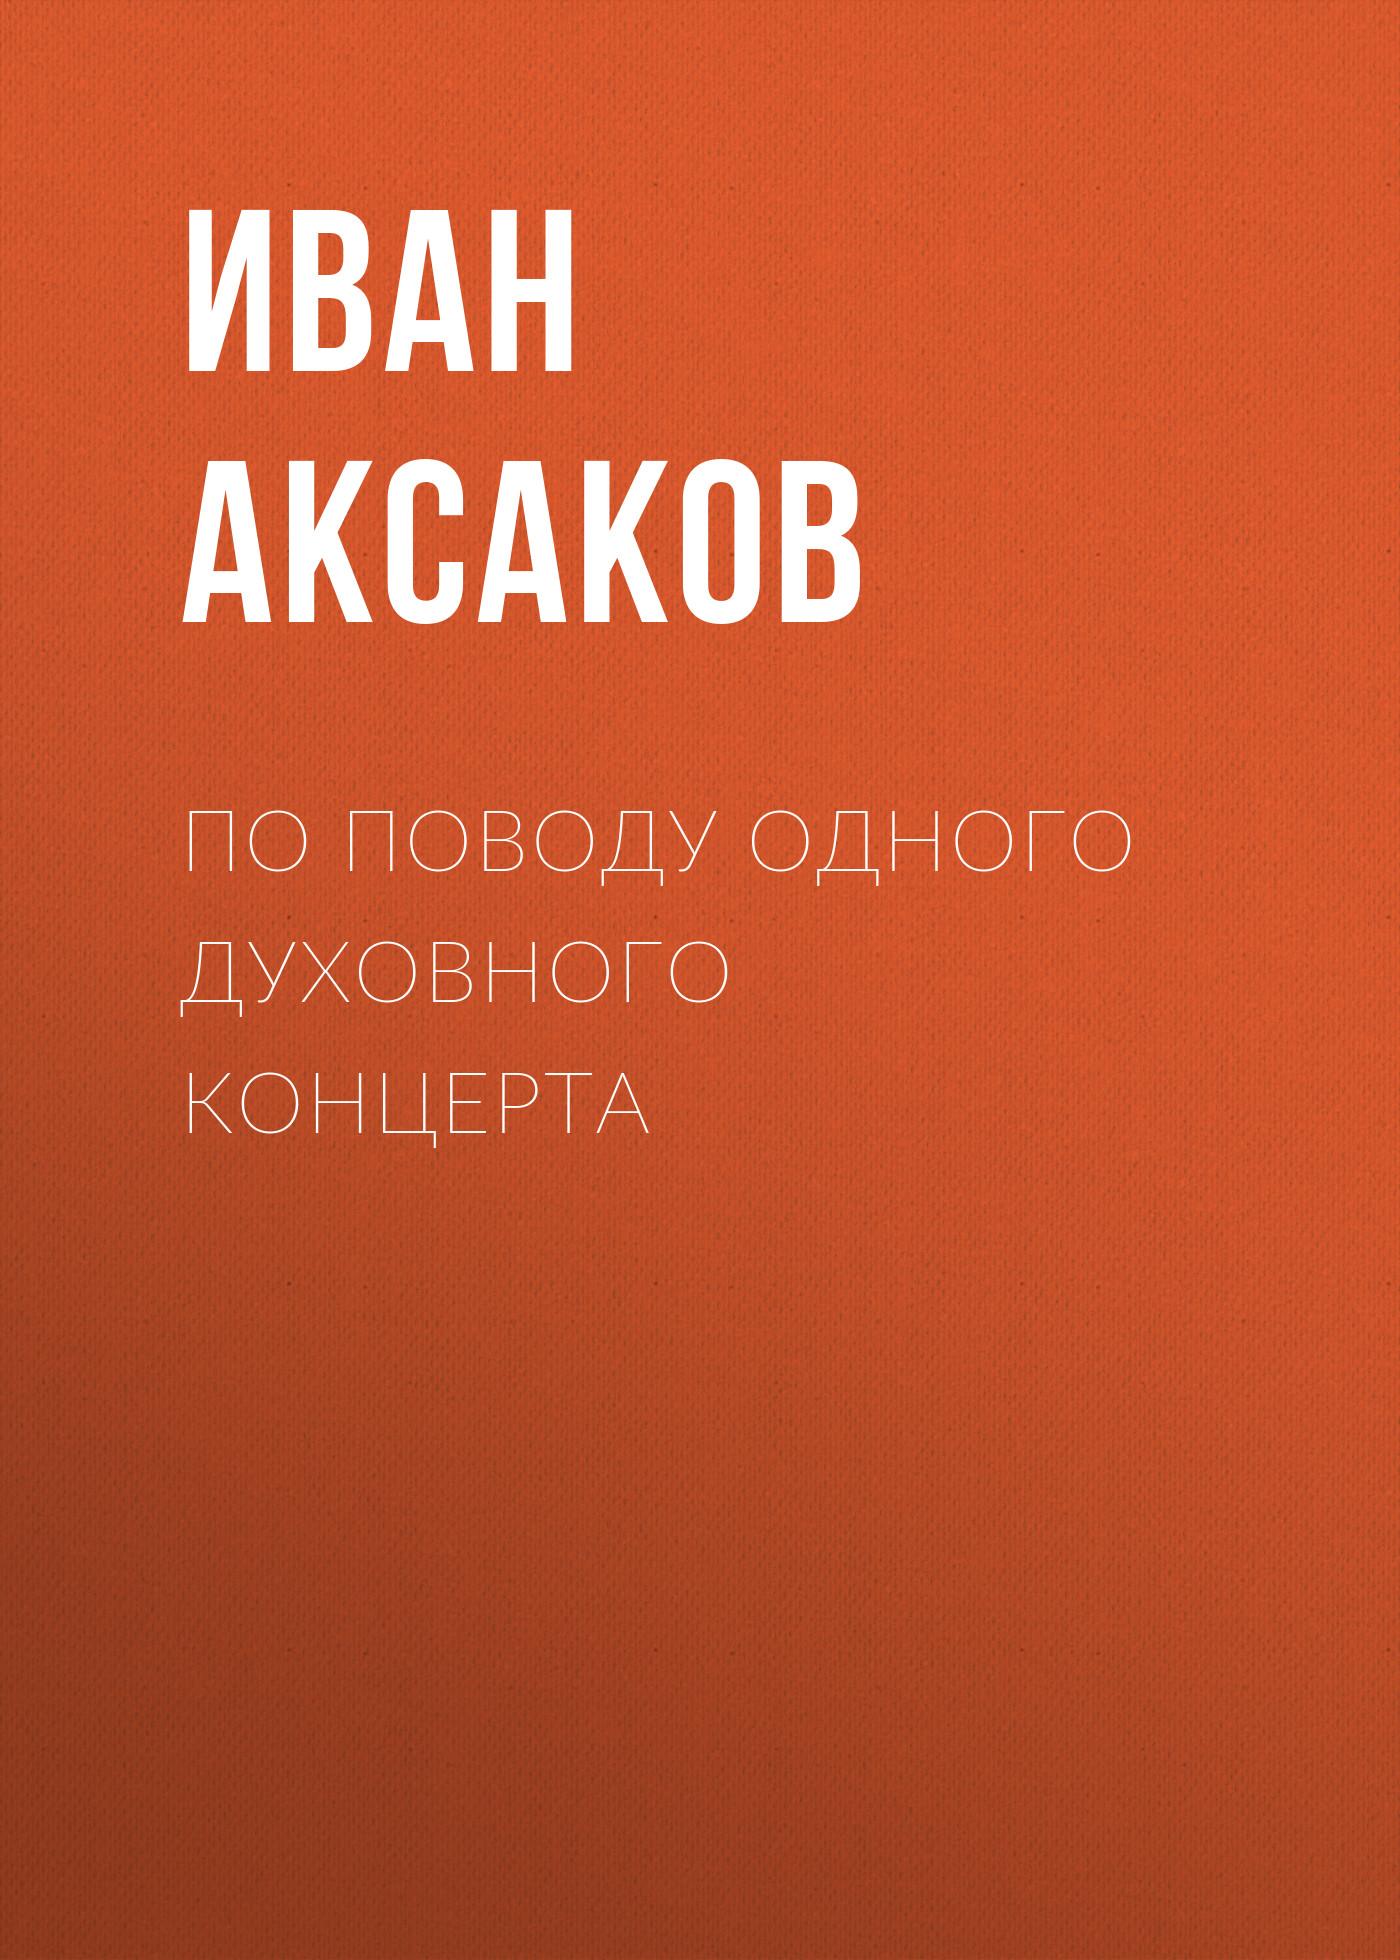 Иван Аксаков По поводу одного духовного концерта иван аксаков по поводу одного духовного концерта